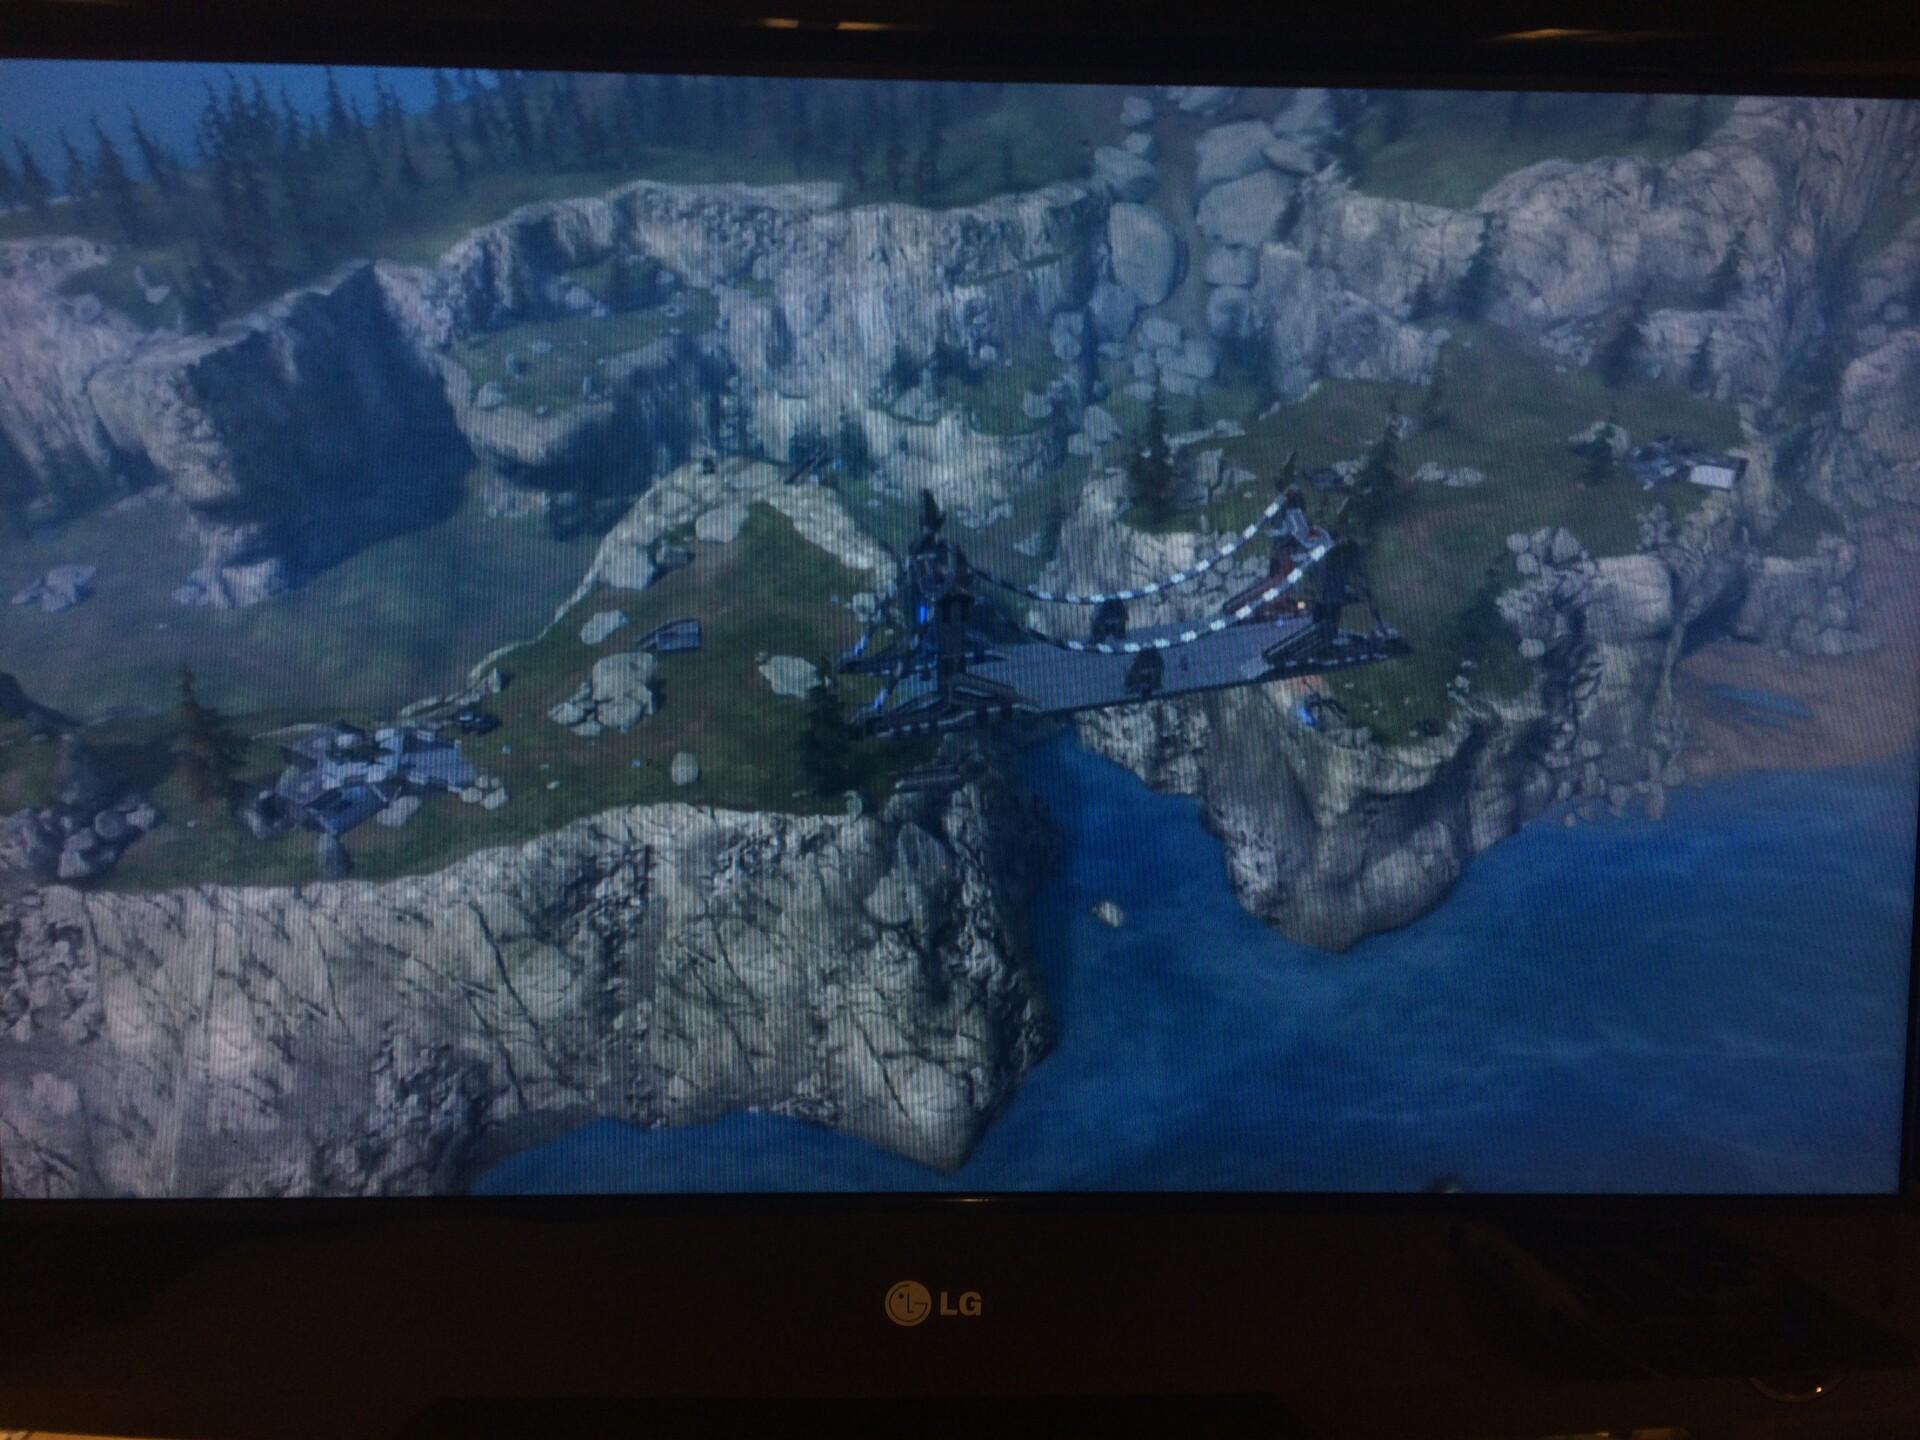 ArtStation - Old Halo Reach Map Designs, Patrick Carranza